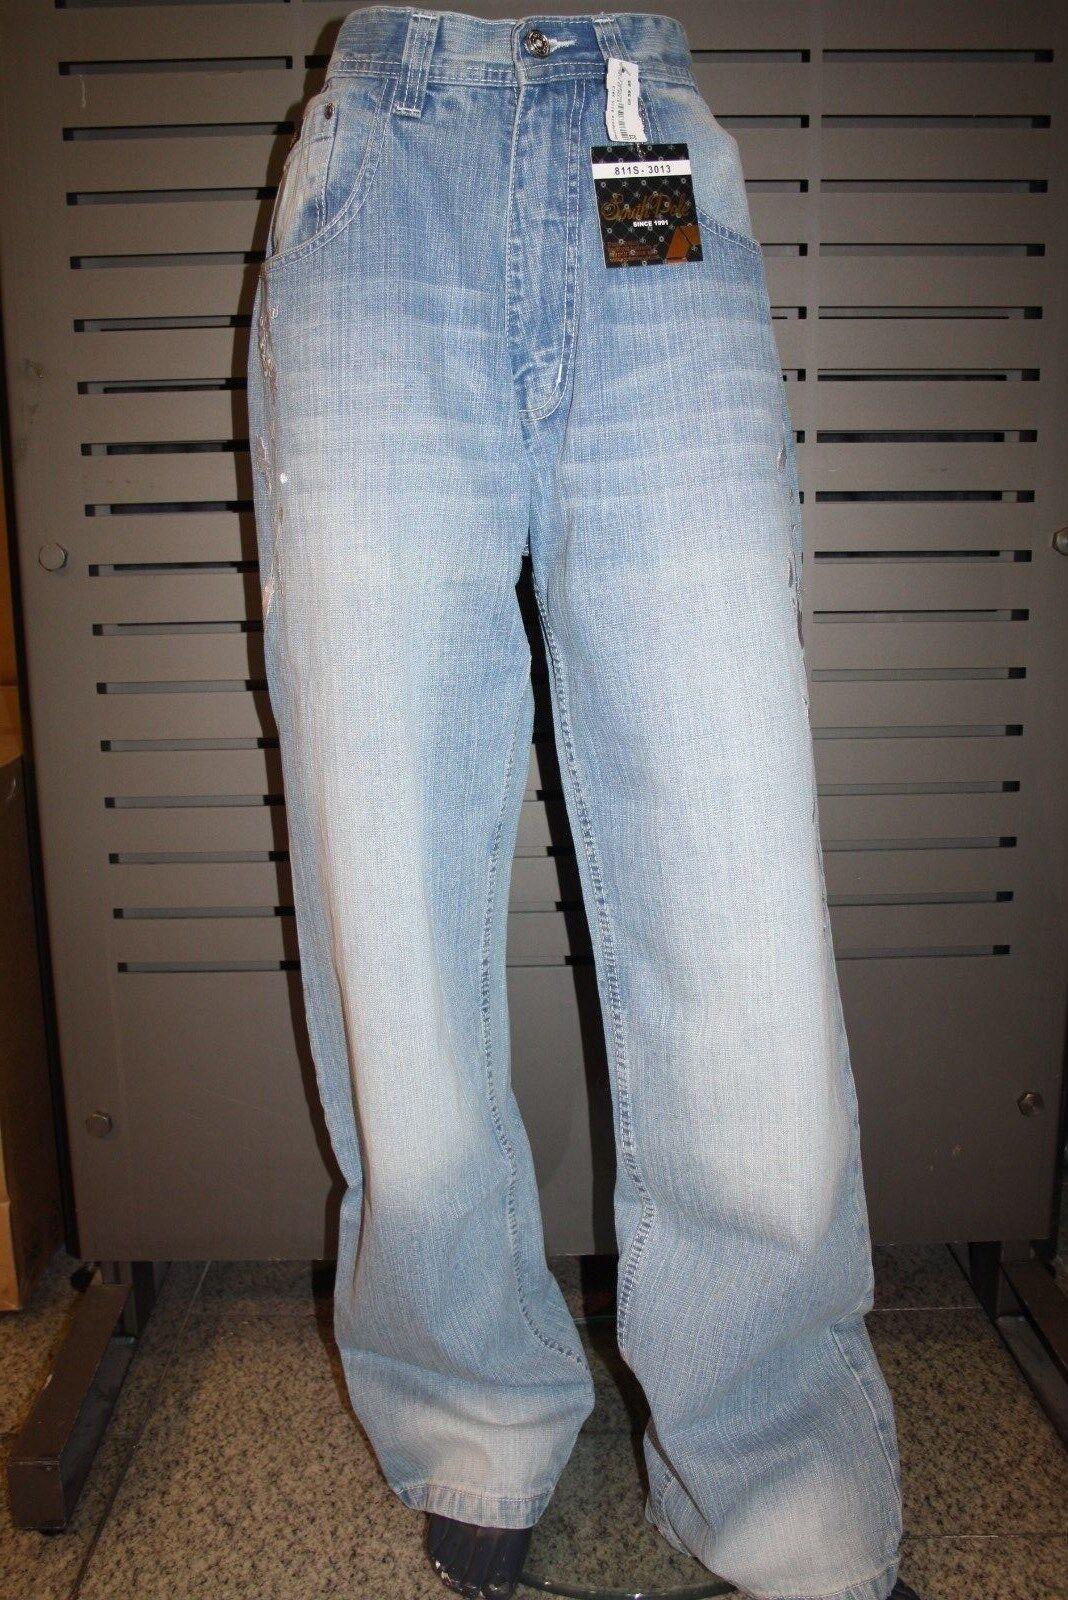 Southpole Baggy Jeans 811s-3013 Light bluee Denim bluee NEW Summer 2018